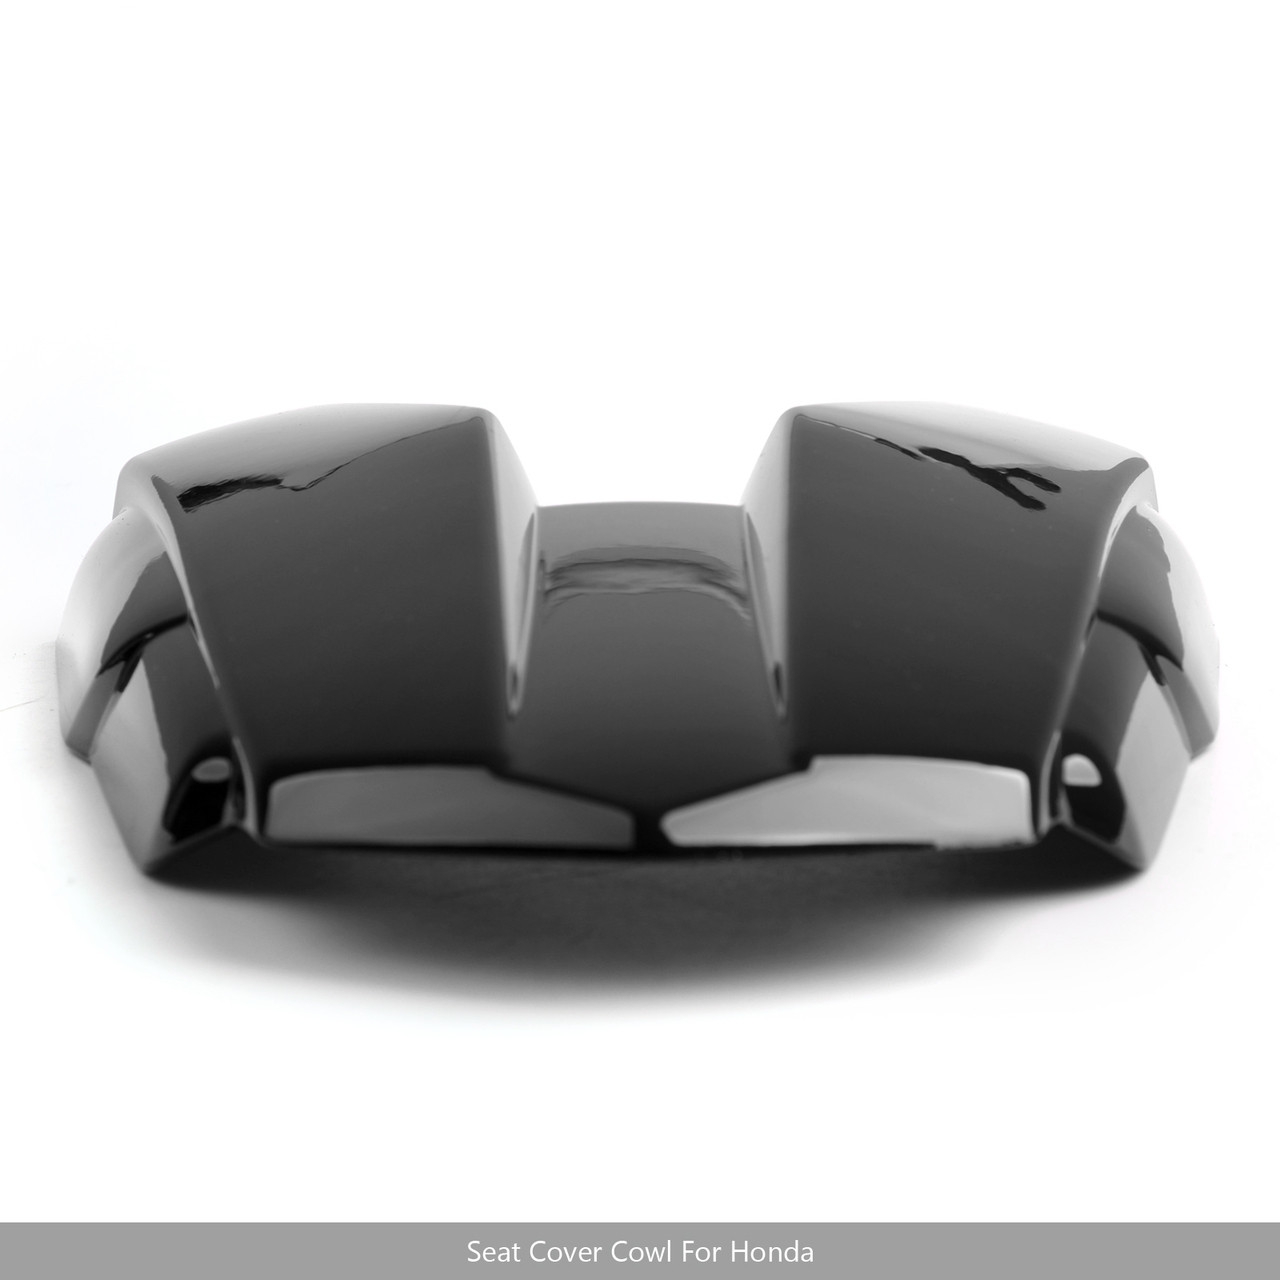 Rear Seat Cover Cowl Fairing Body Tail For Honda CB500F CBR500R 2016-2018 Black